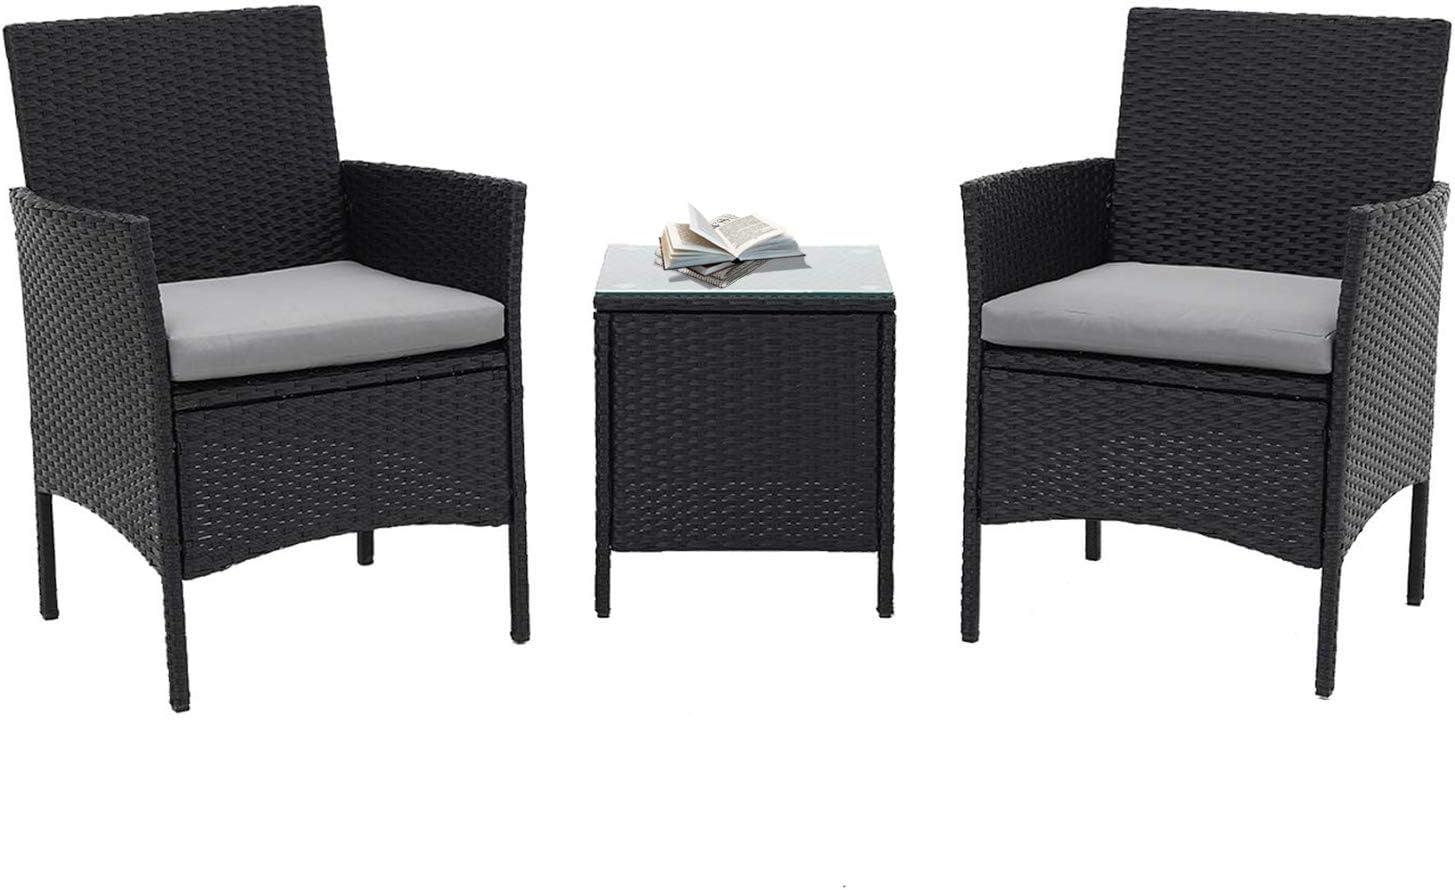 Incbruce Patio Bistro Set 3-Piece Outdoor Wicker Furniture Sets Black Modern Rattan Garden Conversation Chair Table Set Furniture, Black Glass Coffee Table, Light Gray Cushion